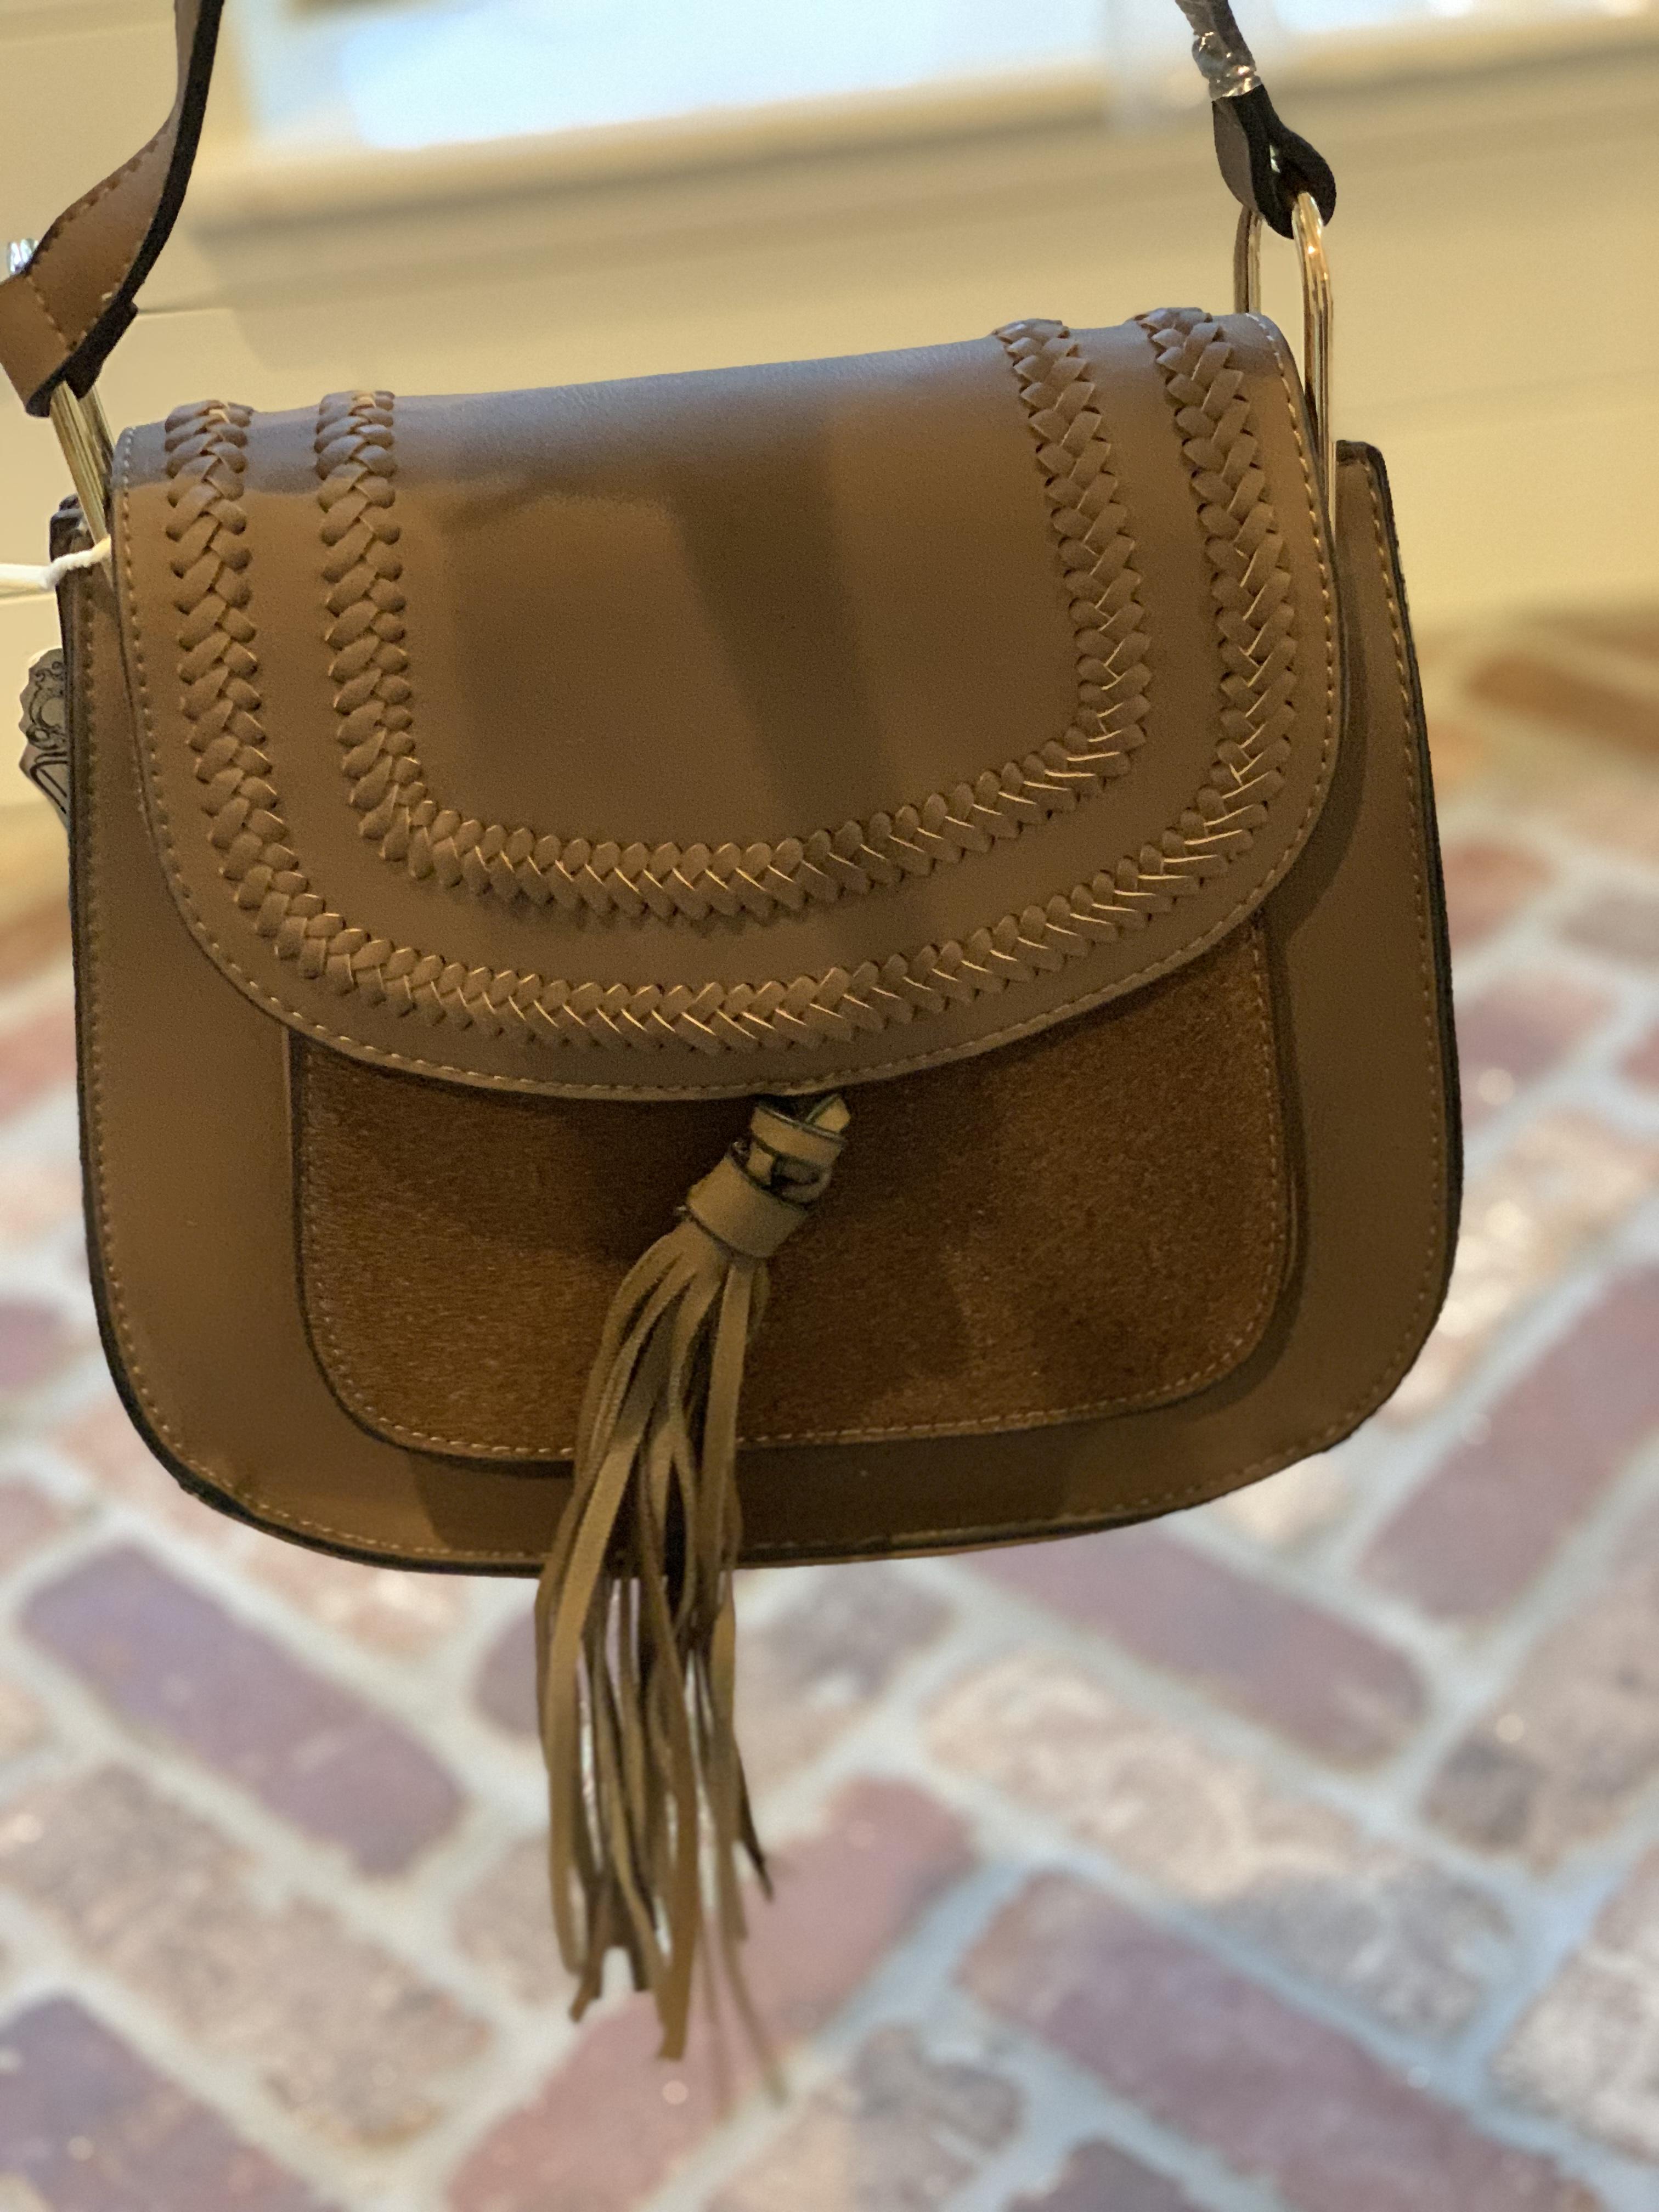 Amazon Favorites featured by top Houston fashion blog, Fancy Ashley: brown crossbody bag